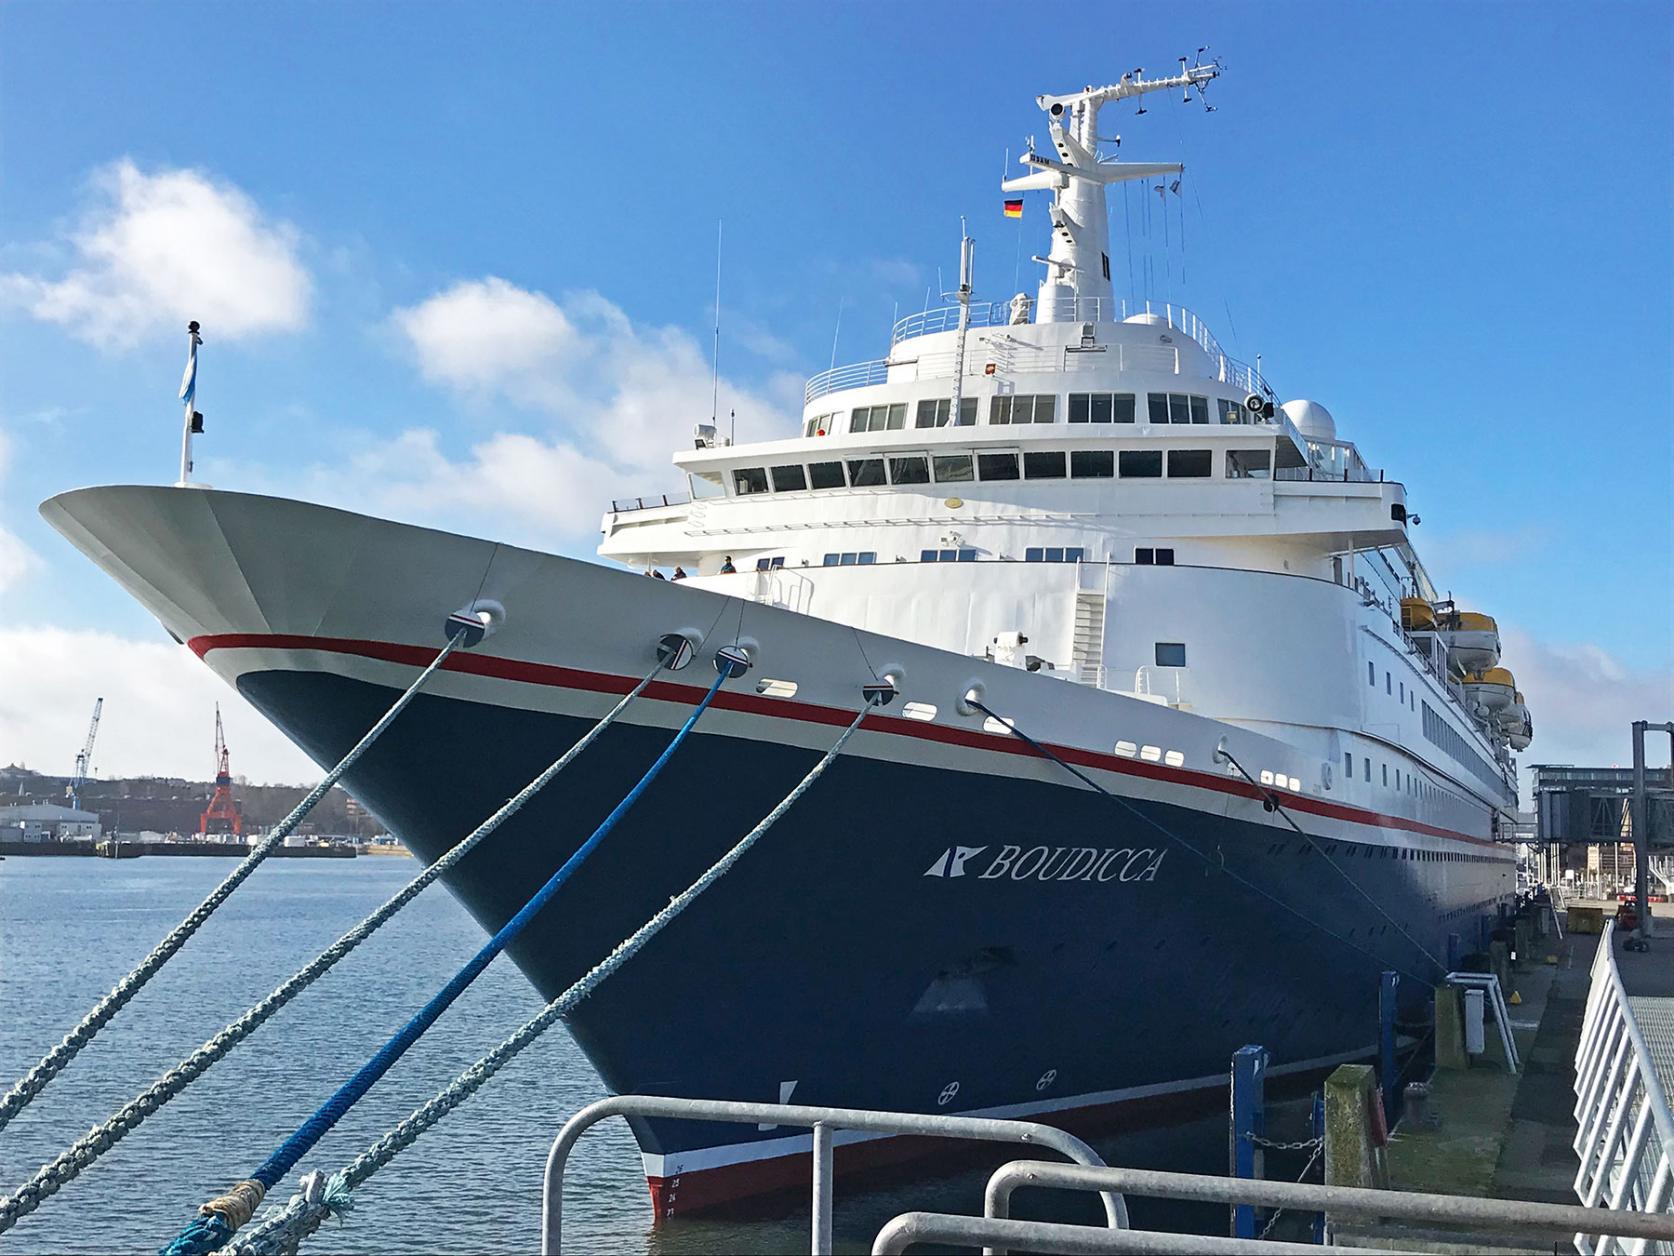 Kreuzfahrt Saison Kiel Tourismus Hafen Förde